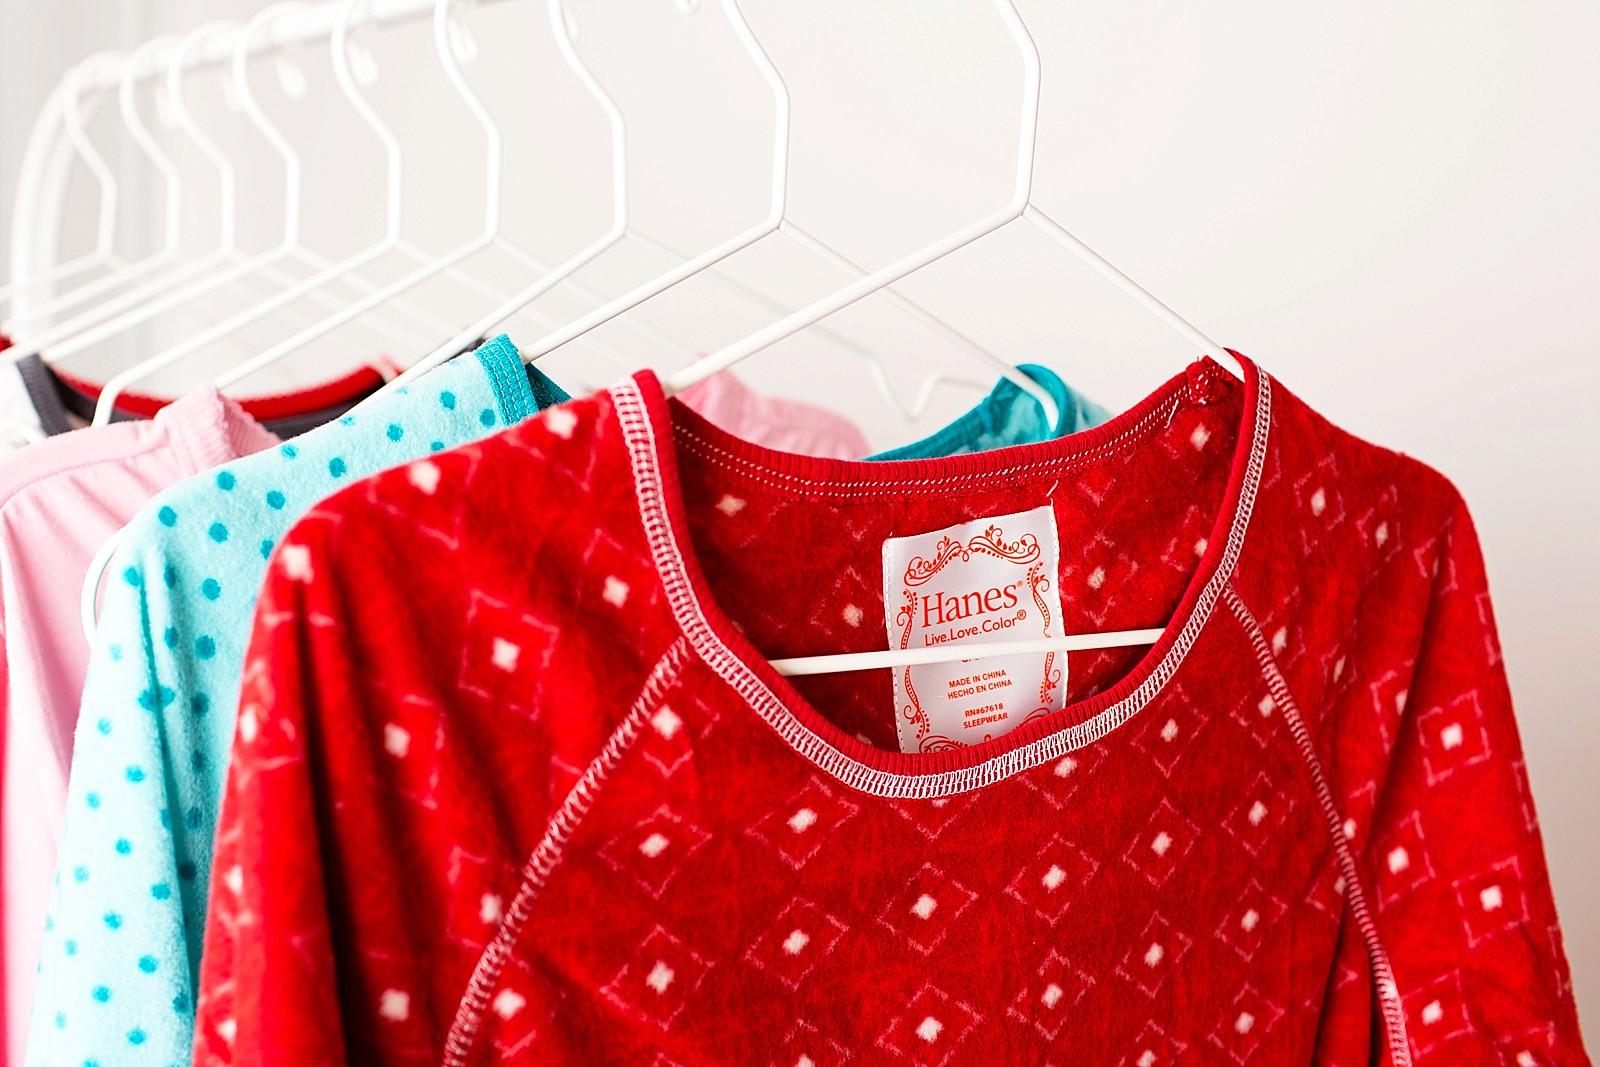 hanes-christmas-pajamas-girls-pajama-party-ideas-cute-jammies-diana-elizabeth-lifestyle-fashion-blogger-phoenix-arizona-1782